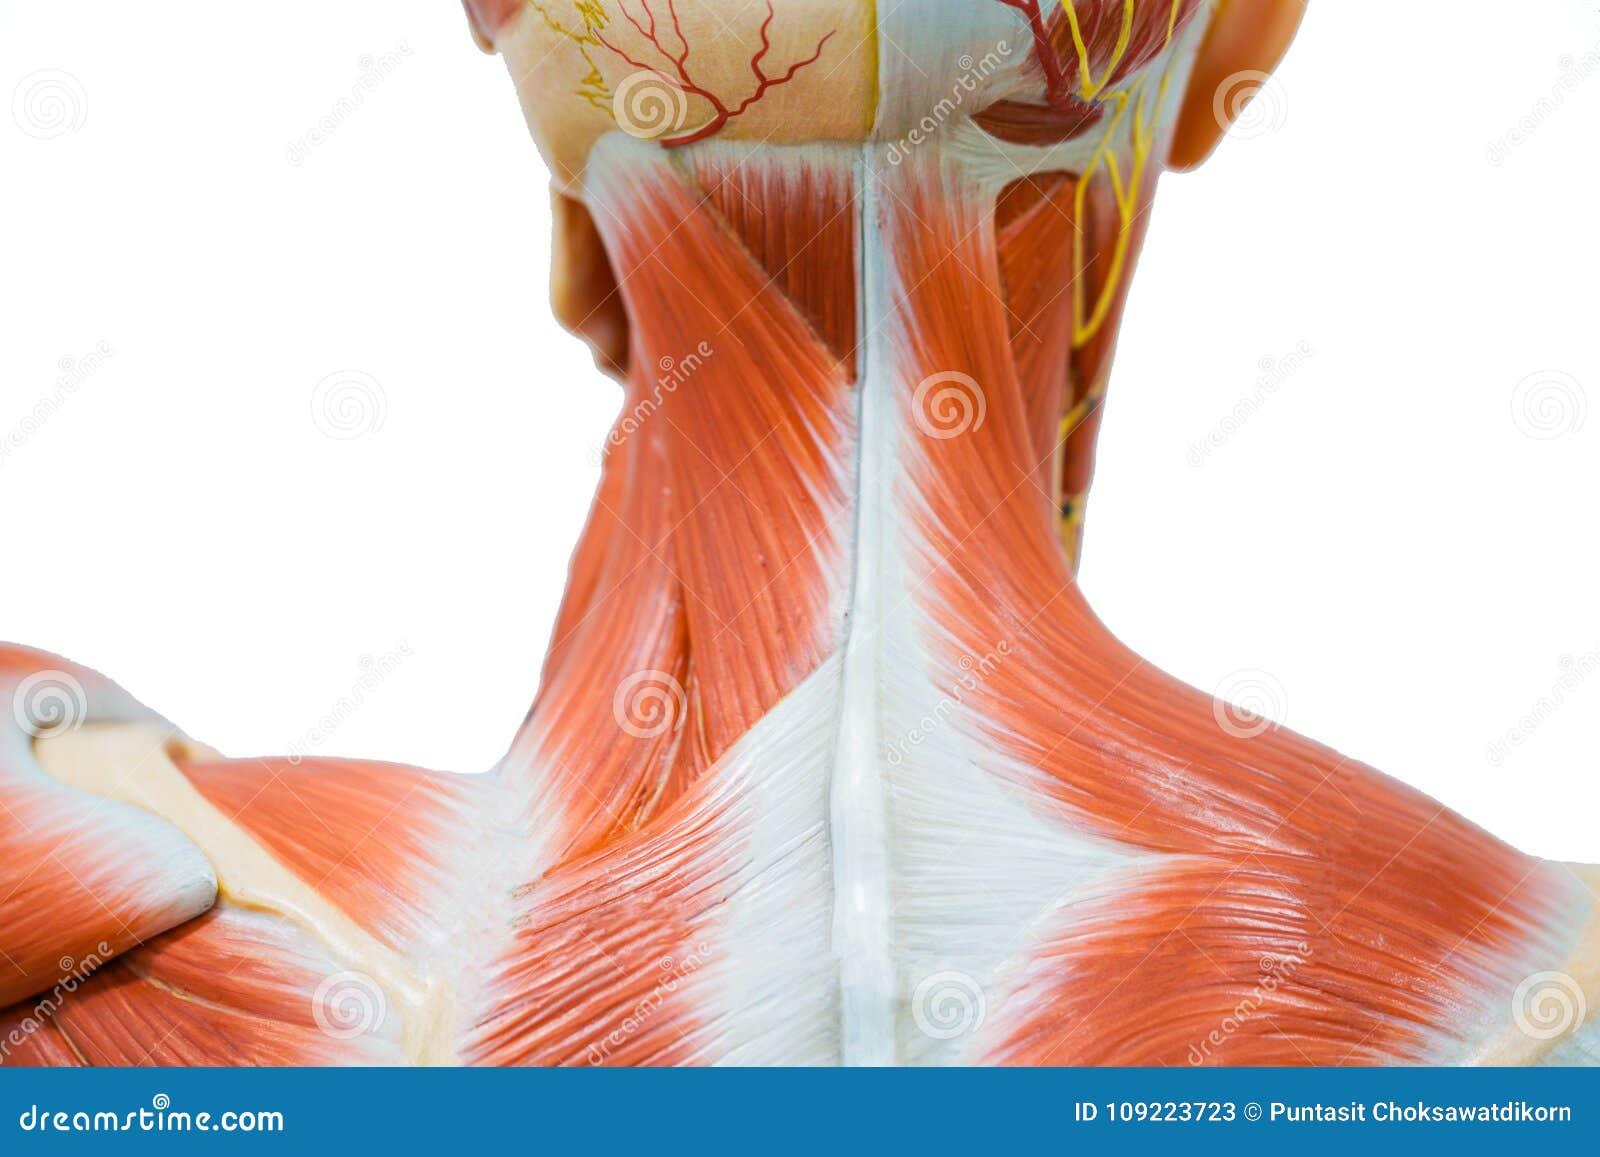 Human Neck Muscle Anatomy Stock Image Image Of Abdominal 109223723